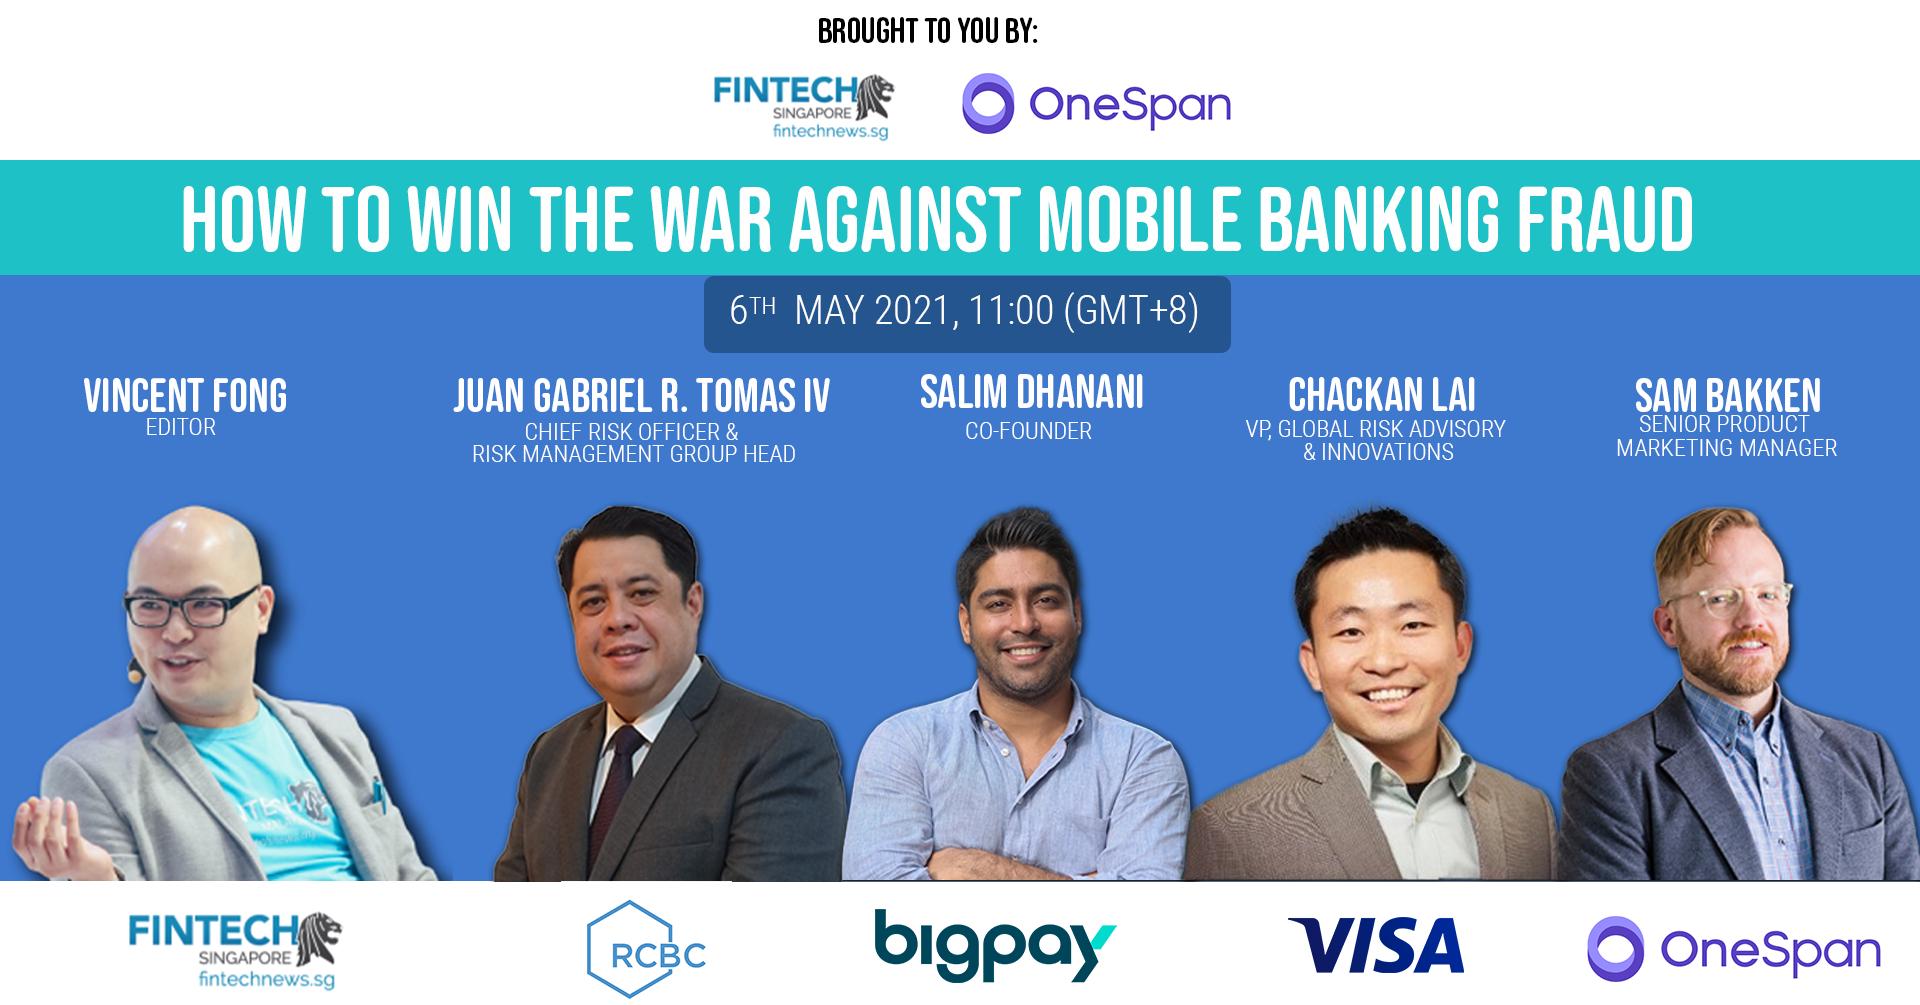 OneSpan mobile banking fraud webinar